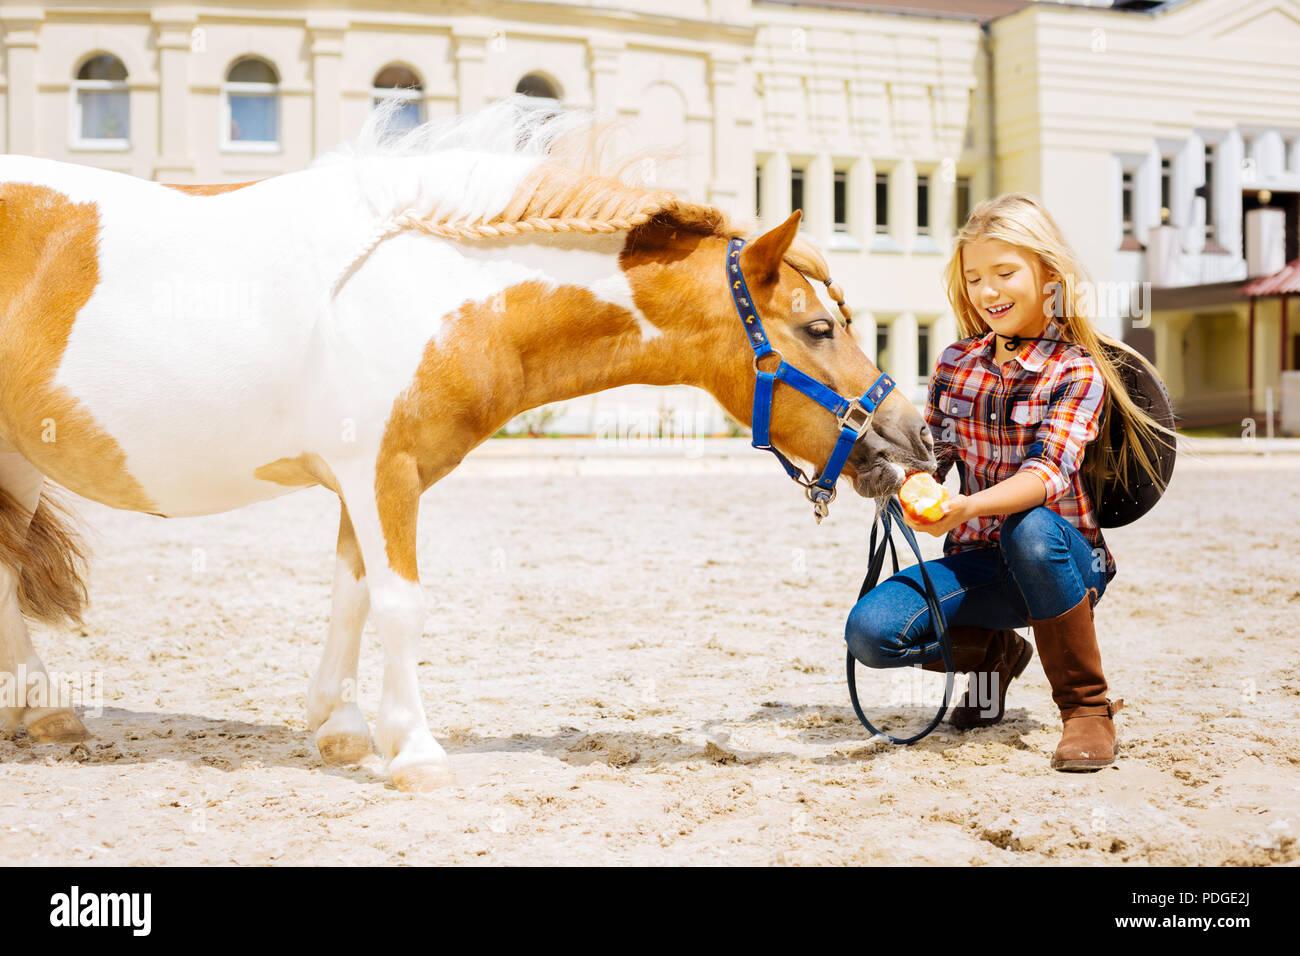 Divertido schoolgirl pasaba sus fines de semana cerca de estable a caballo Foto de stock